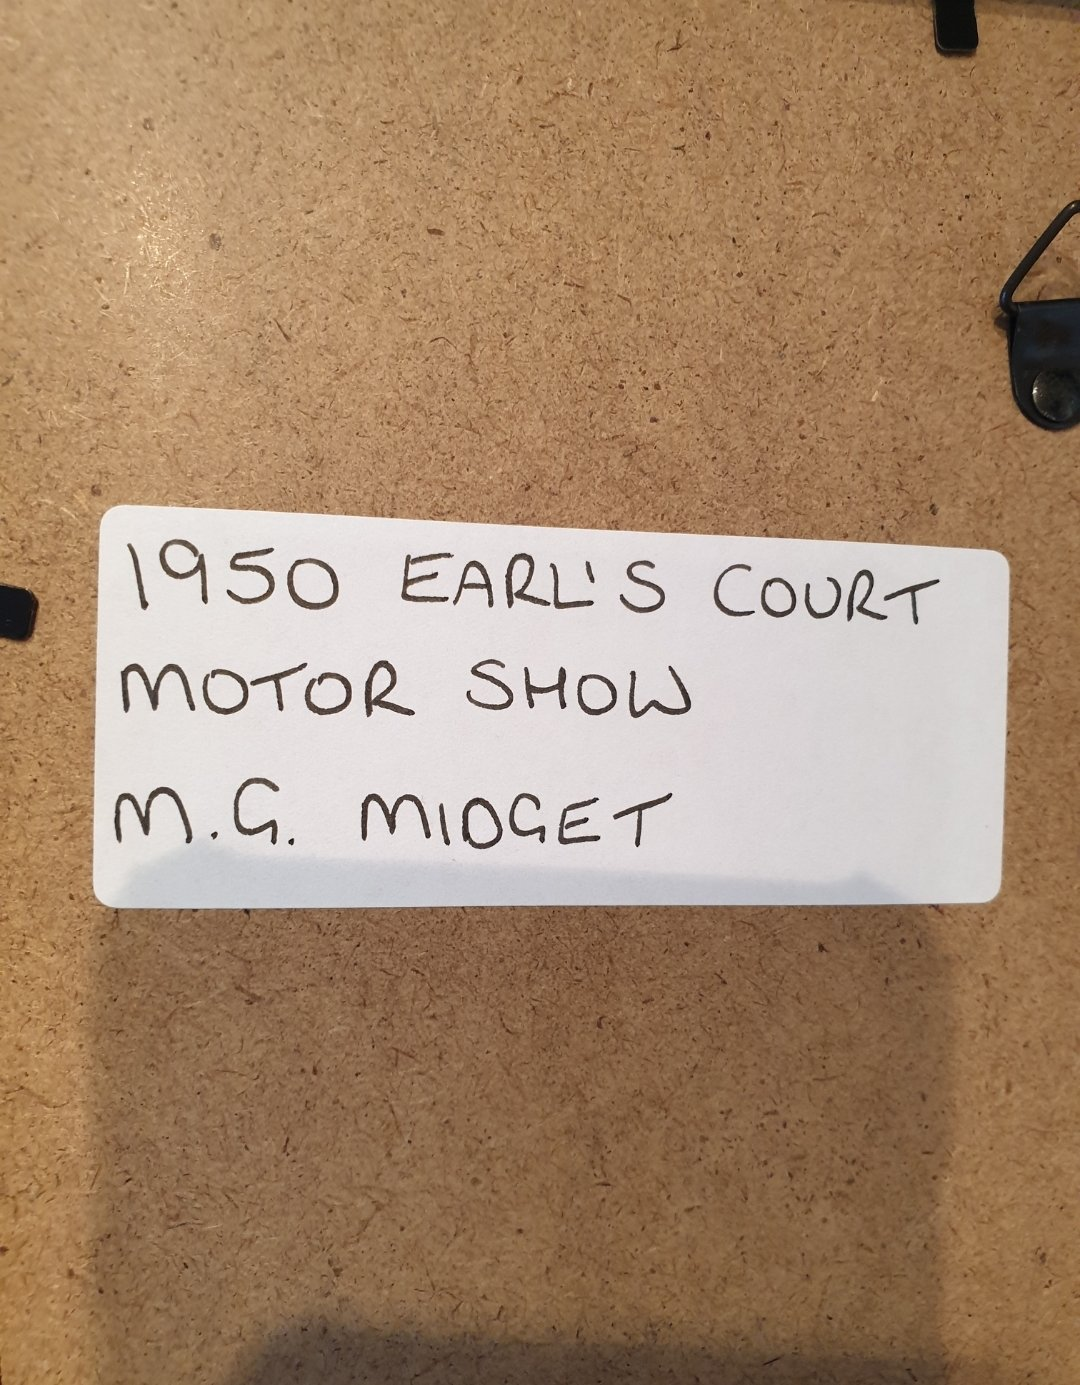 1950 MG Midget Framed Advert Original  For Sale (picture 2 of 2)